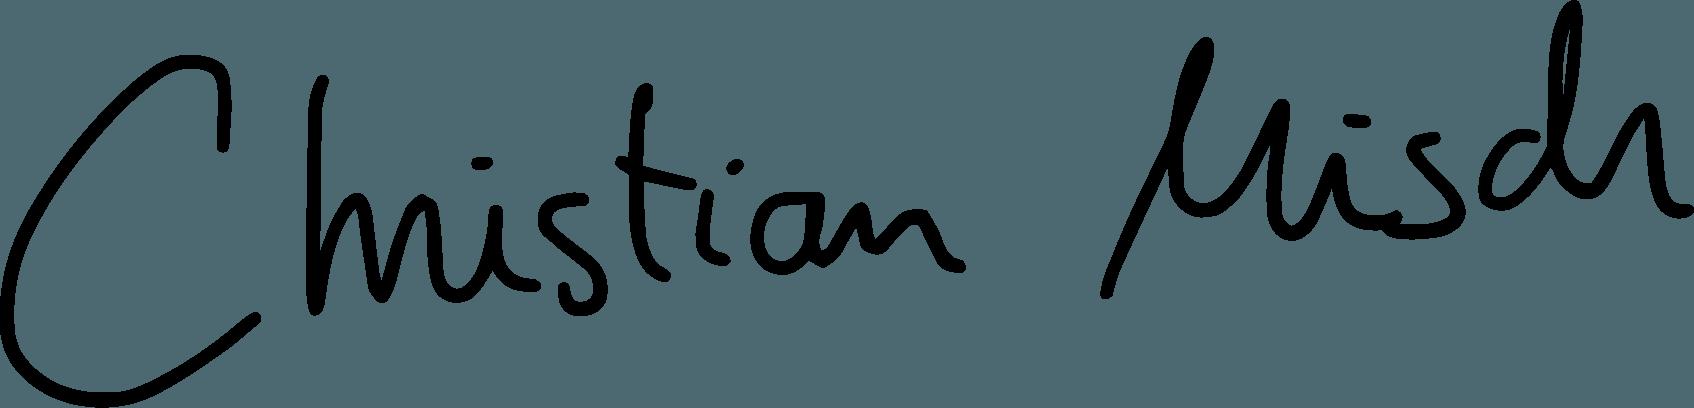 Nueva Firma Christian 2@4x-8